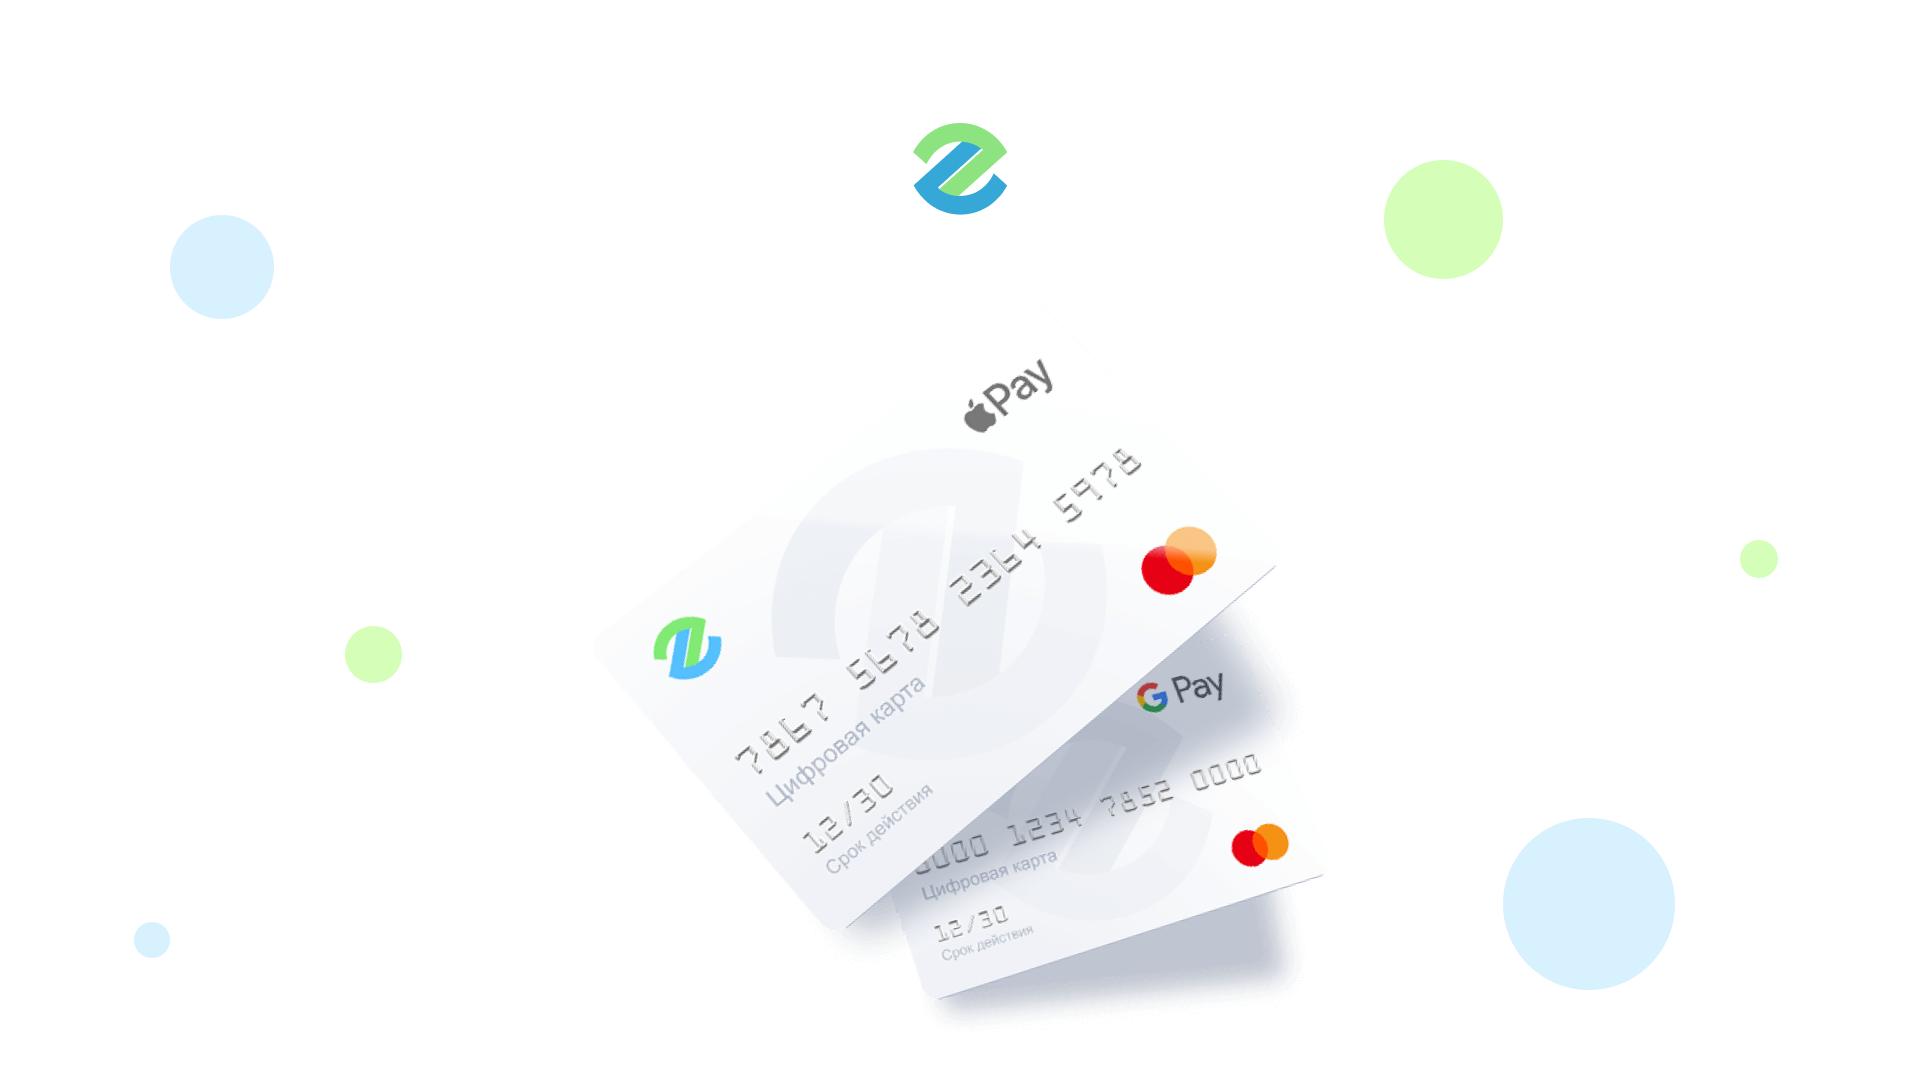 birtualnaja karta zamzam2 2 - Банковская карта для мигрантов от Zamzam – просто, быстро, доступно